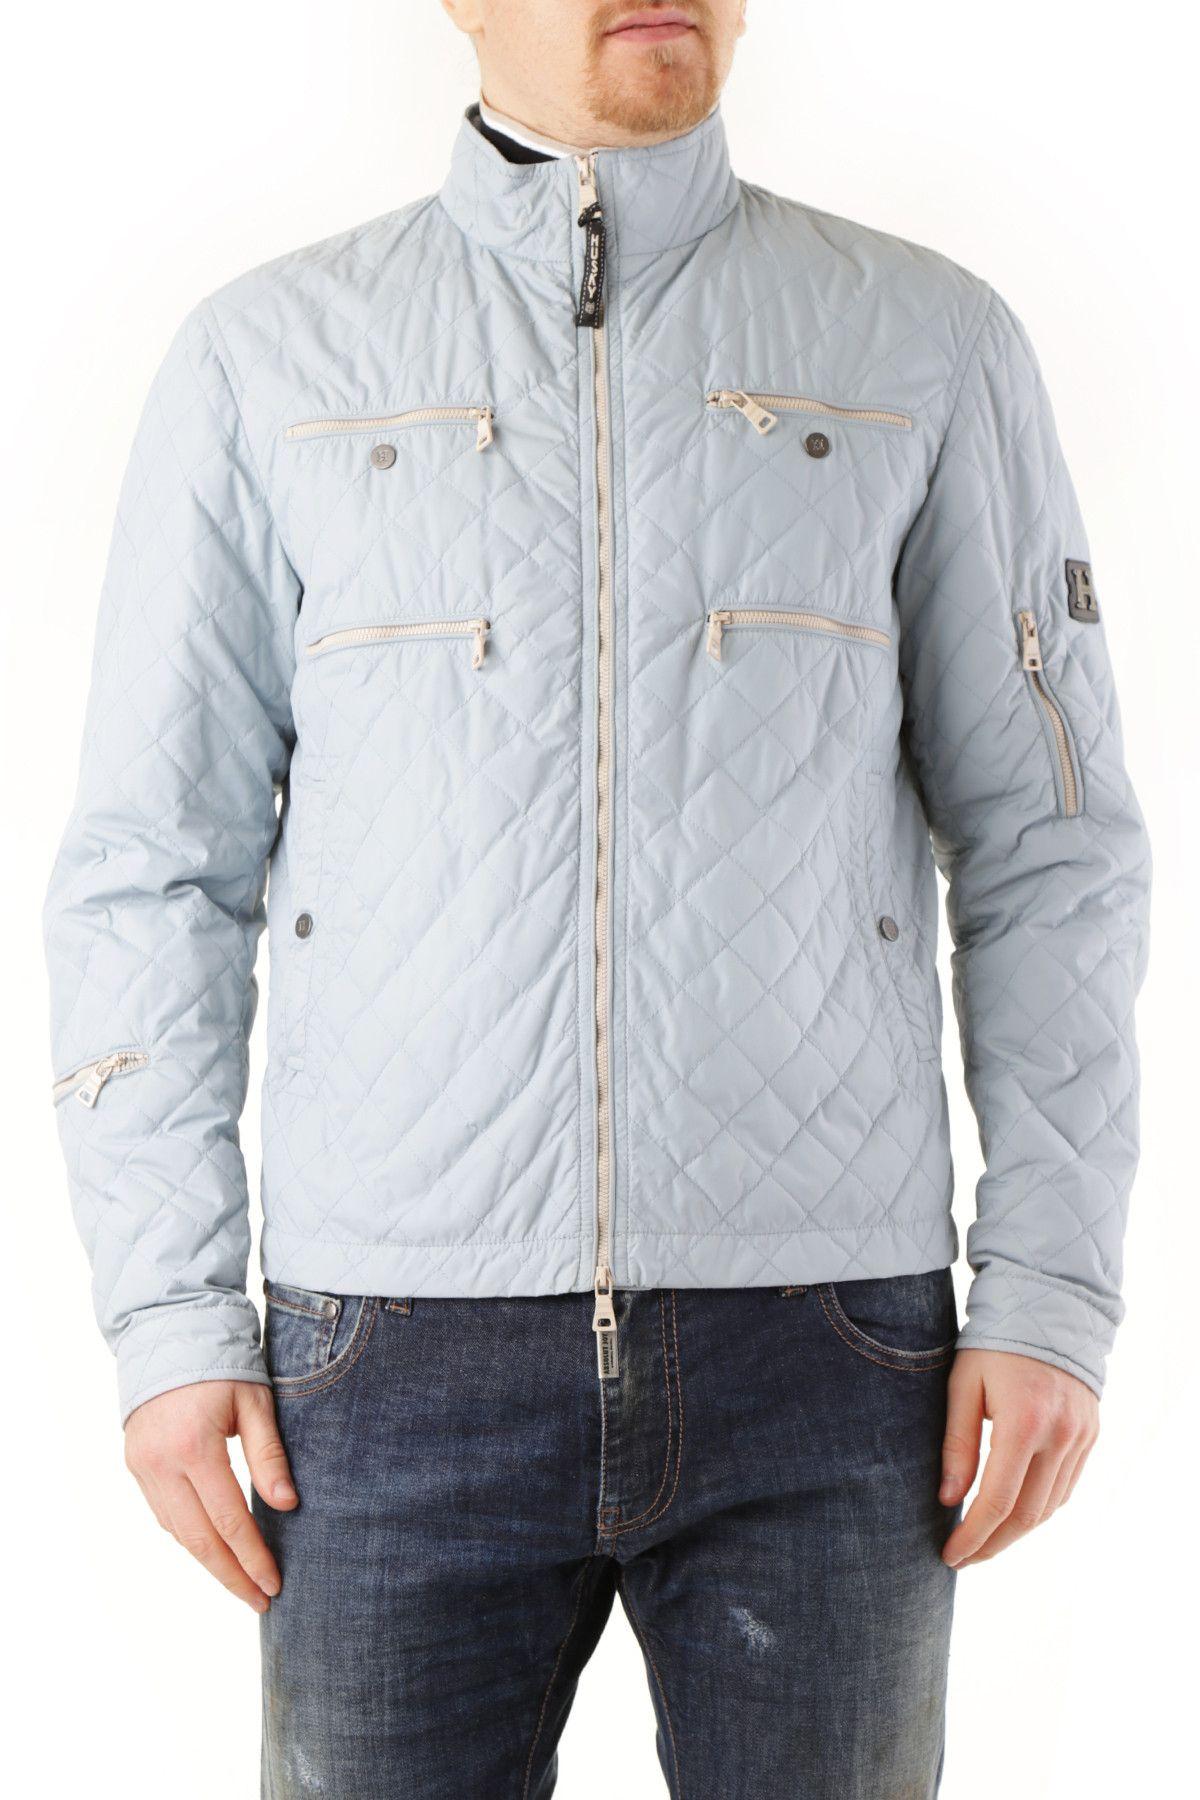 Husky Men's Jacket In Light Blue